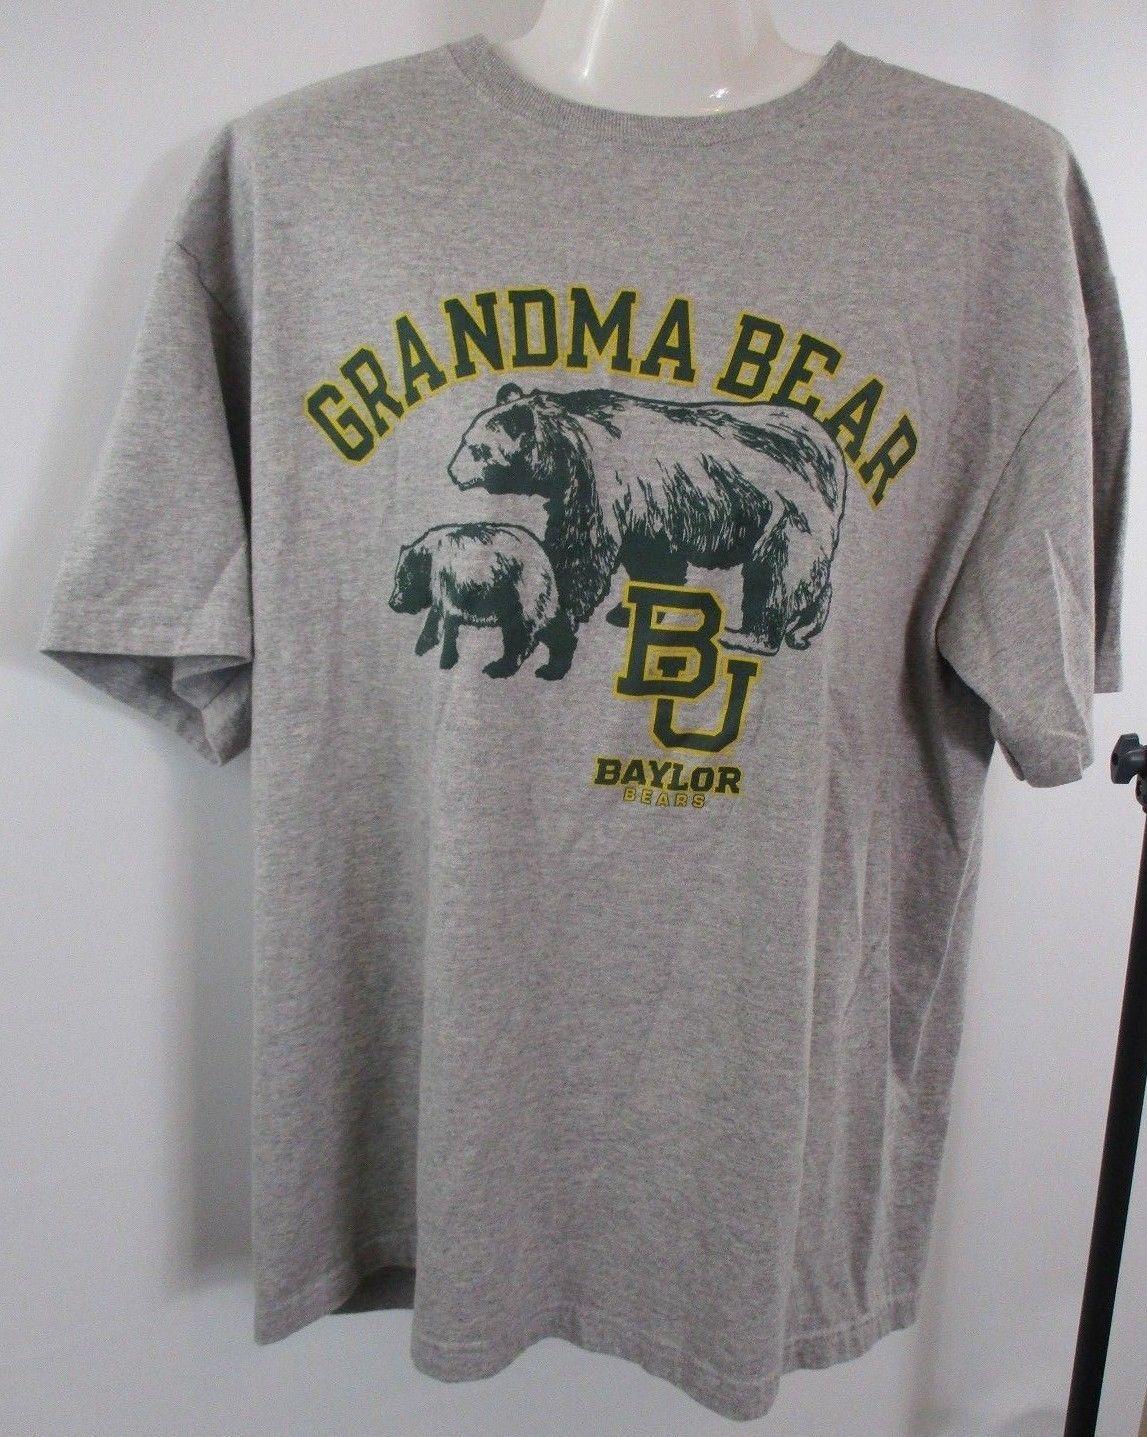 566c7ce5 S l1600. S l1600. Previous. Champion Sz L Gray BU BAYLOR UNIVERSITY Grandma  Bear Short Sleeve T Shirt Top